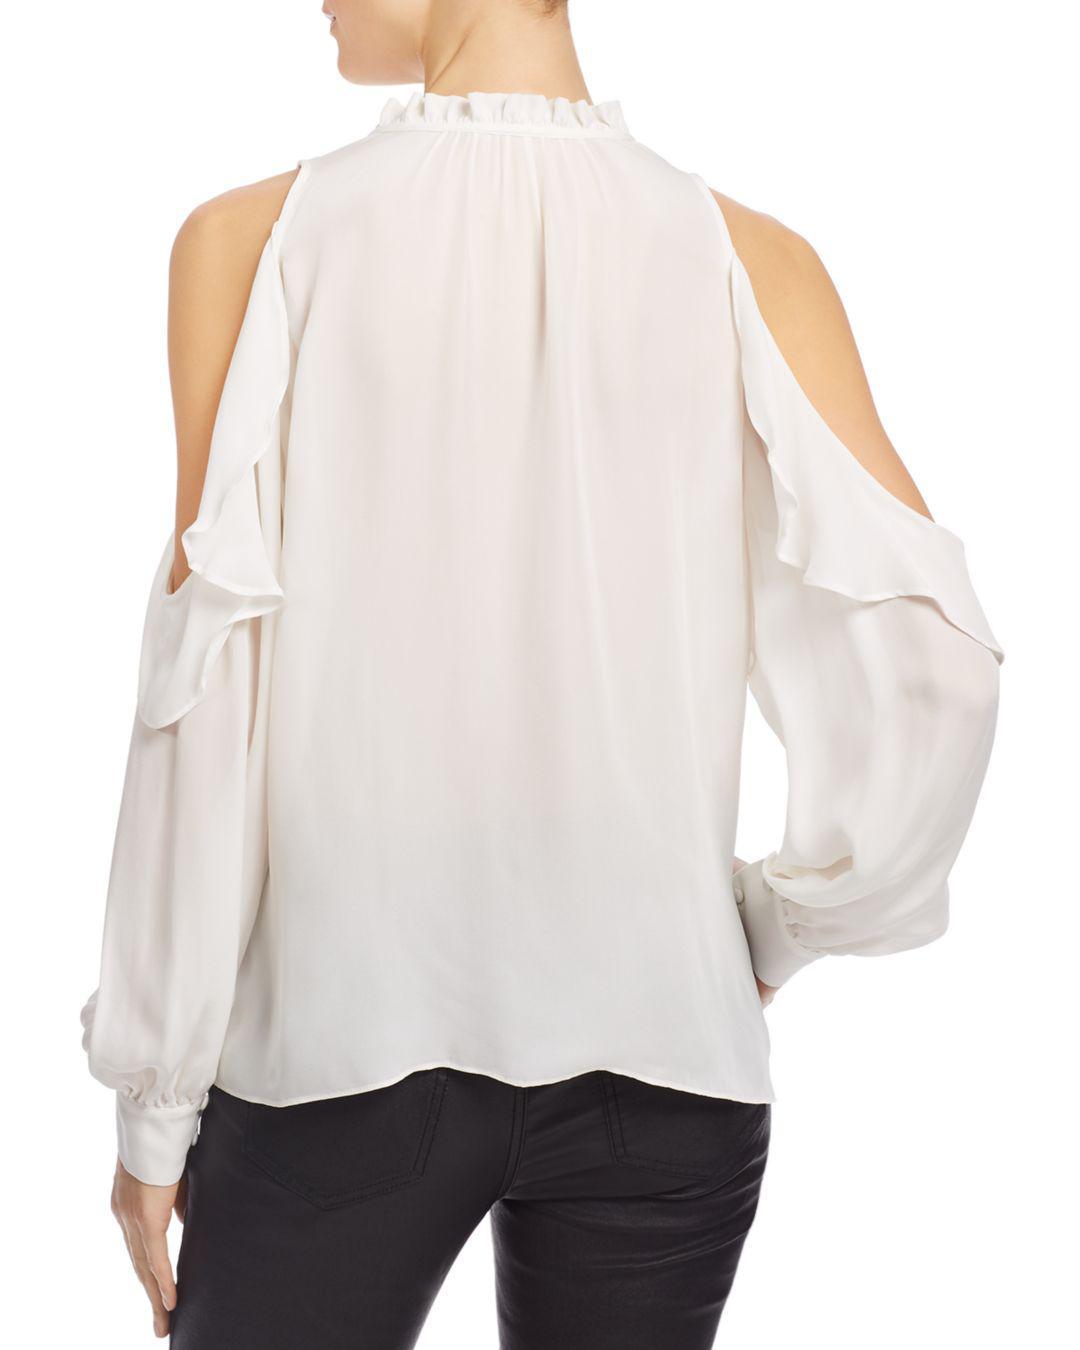 92e6ec00e7217 Parker Marjorie Ruffled Cold-shoulder Top in White - Save 1% - Lyst